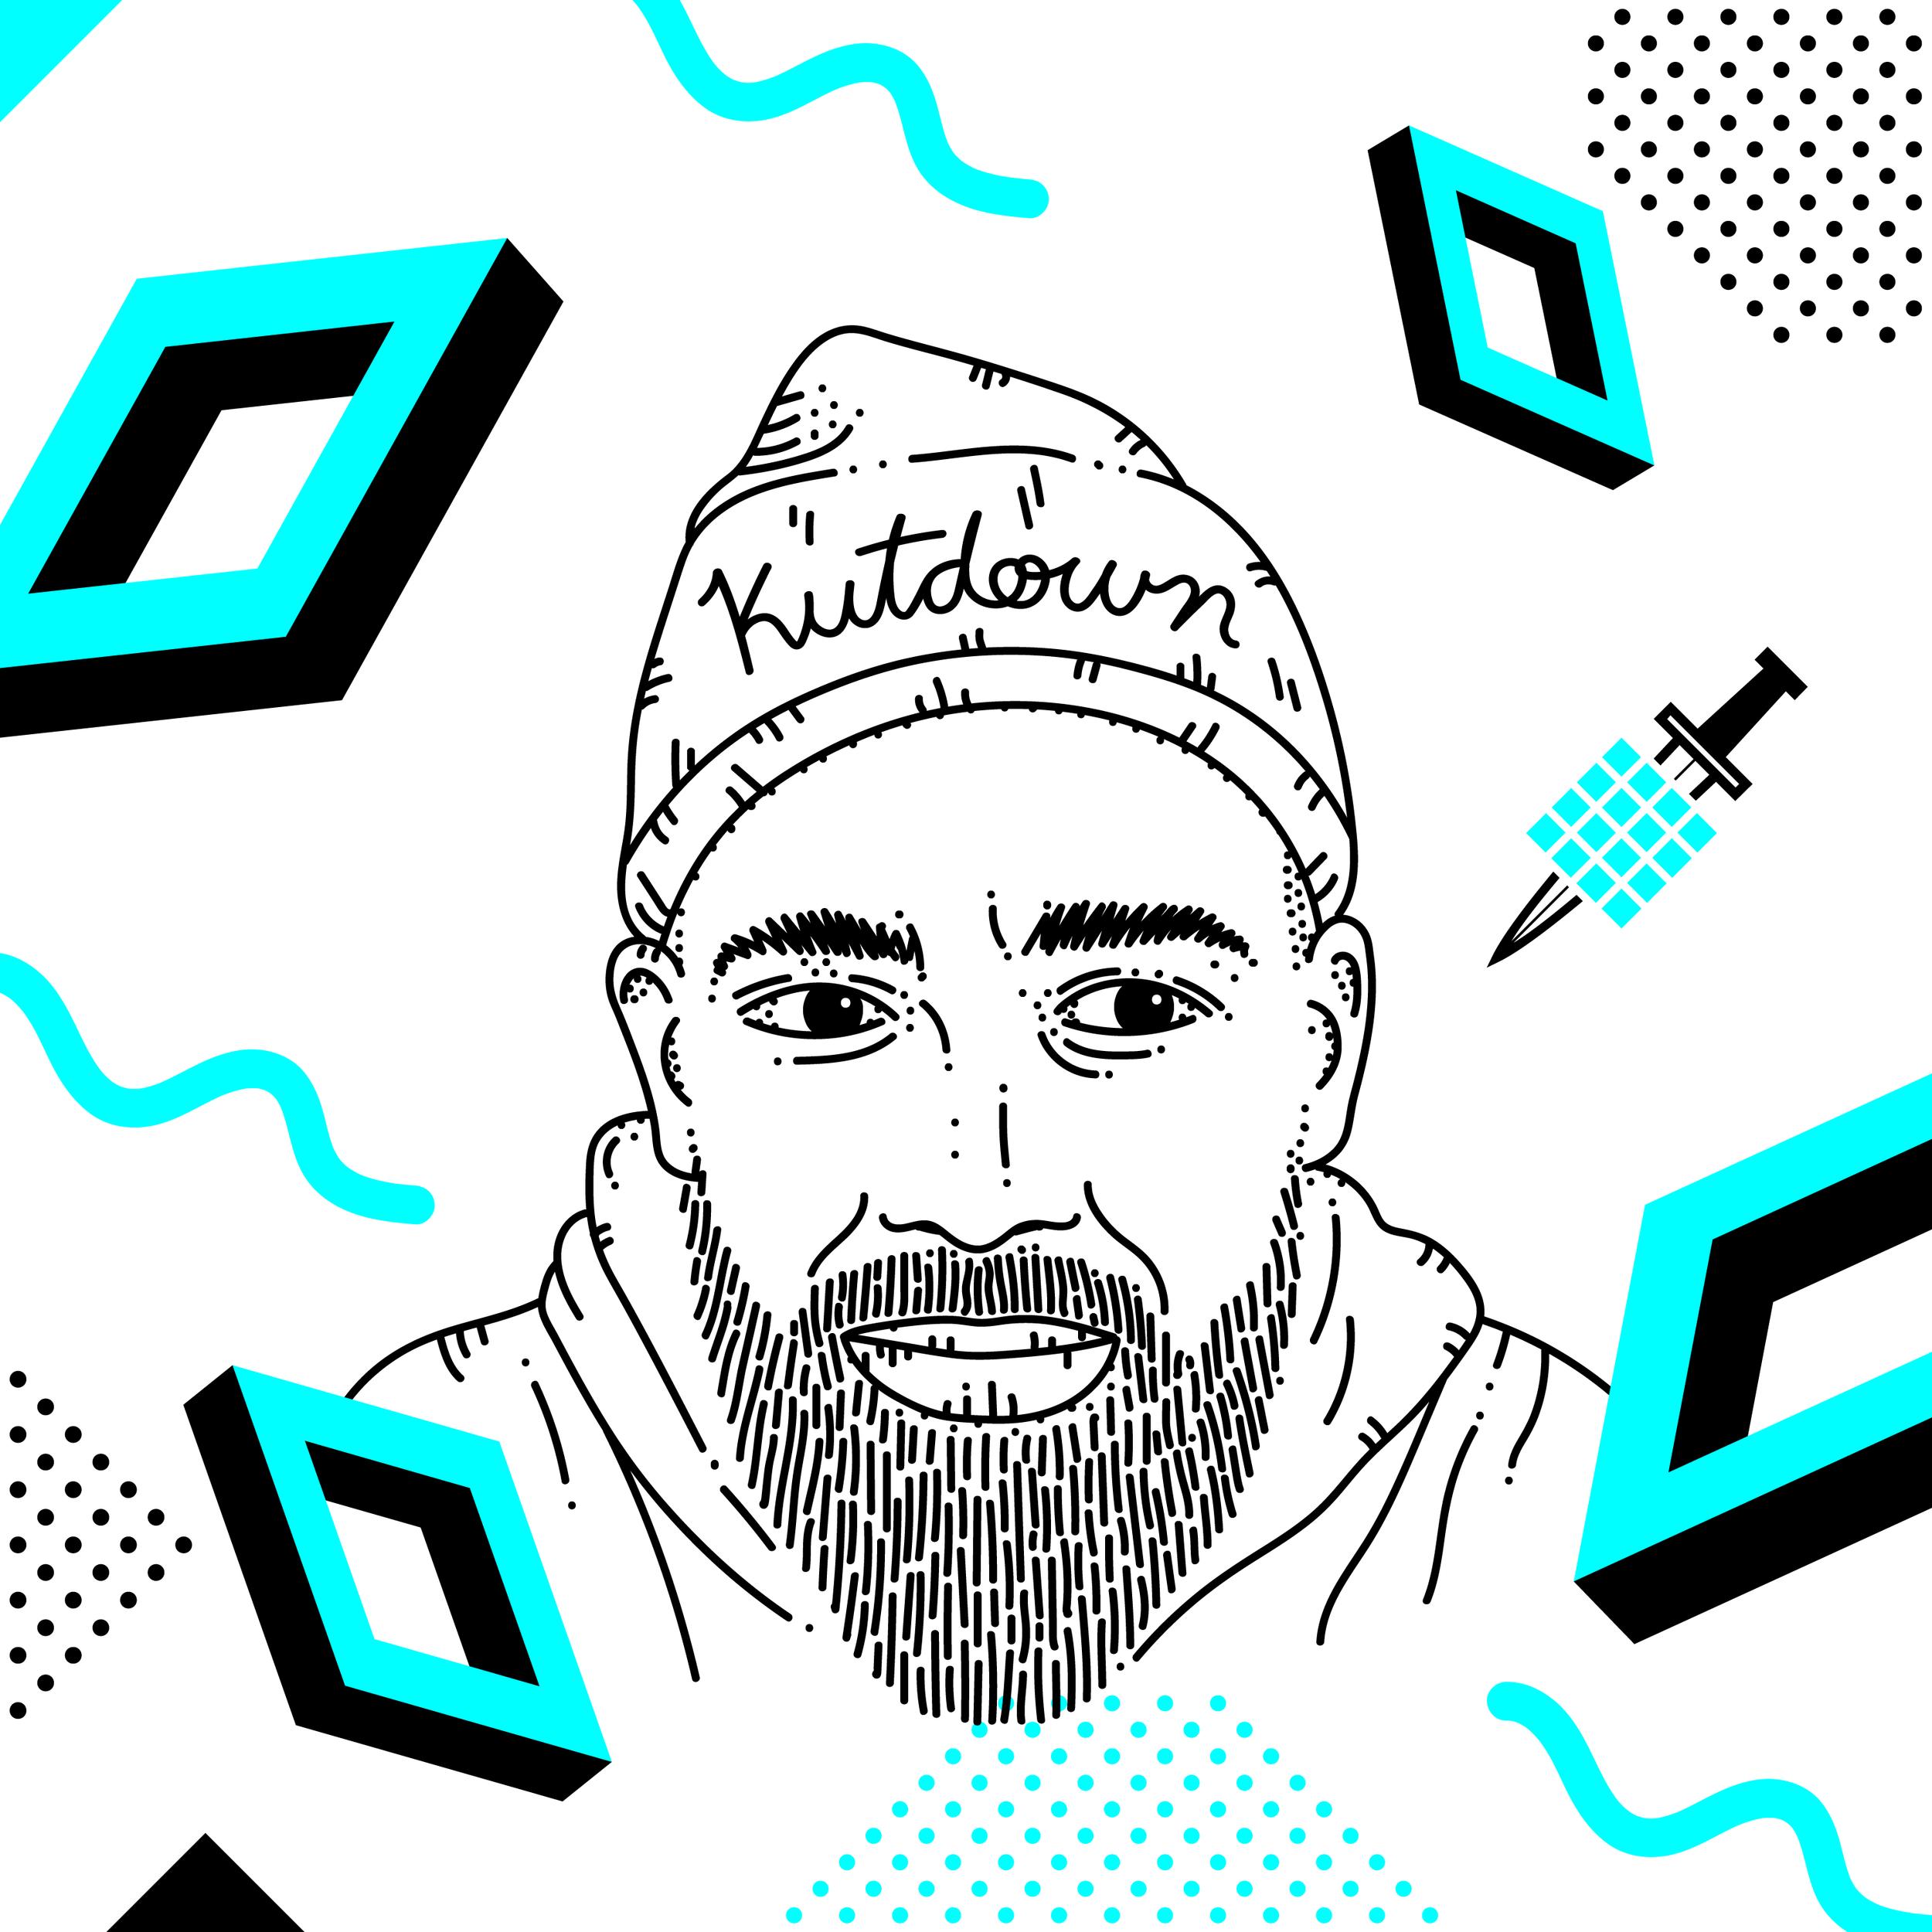 Episode 22 - DJ Kutdown - Frek Sho / foultone records